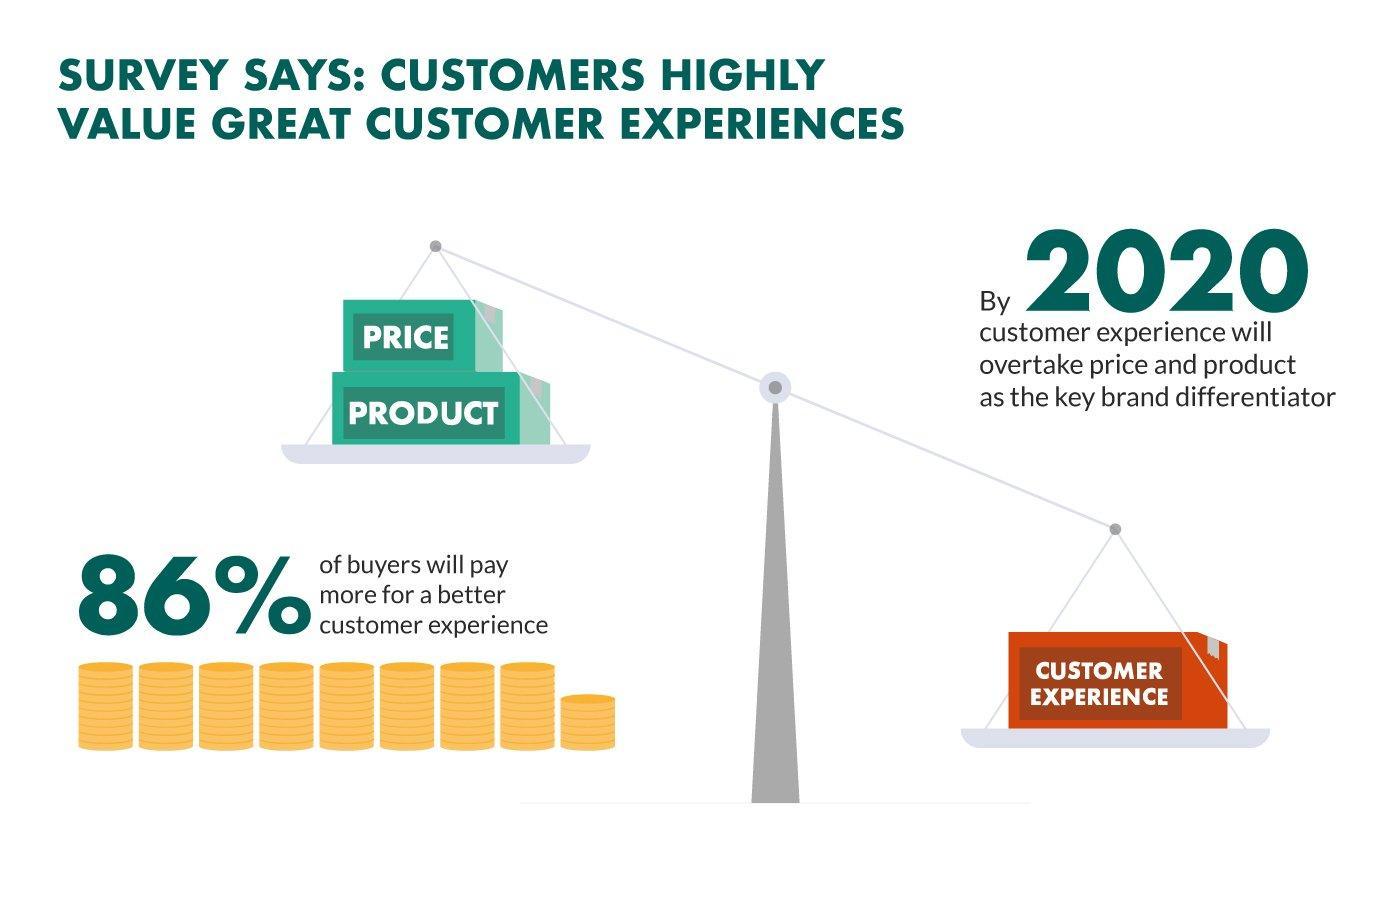 customer experience key brand differentiator